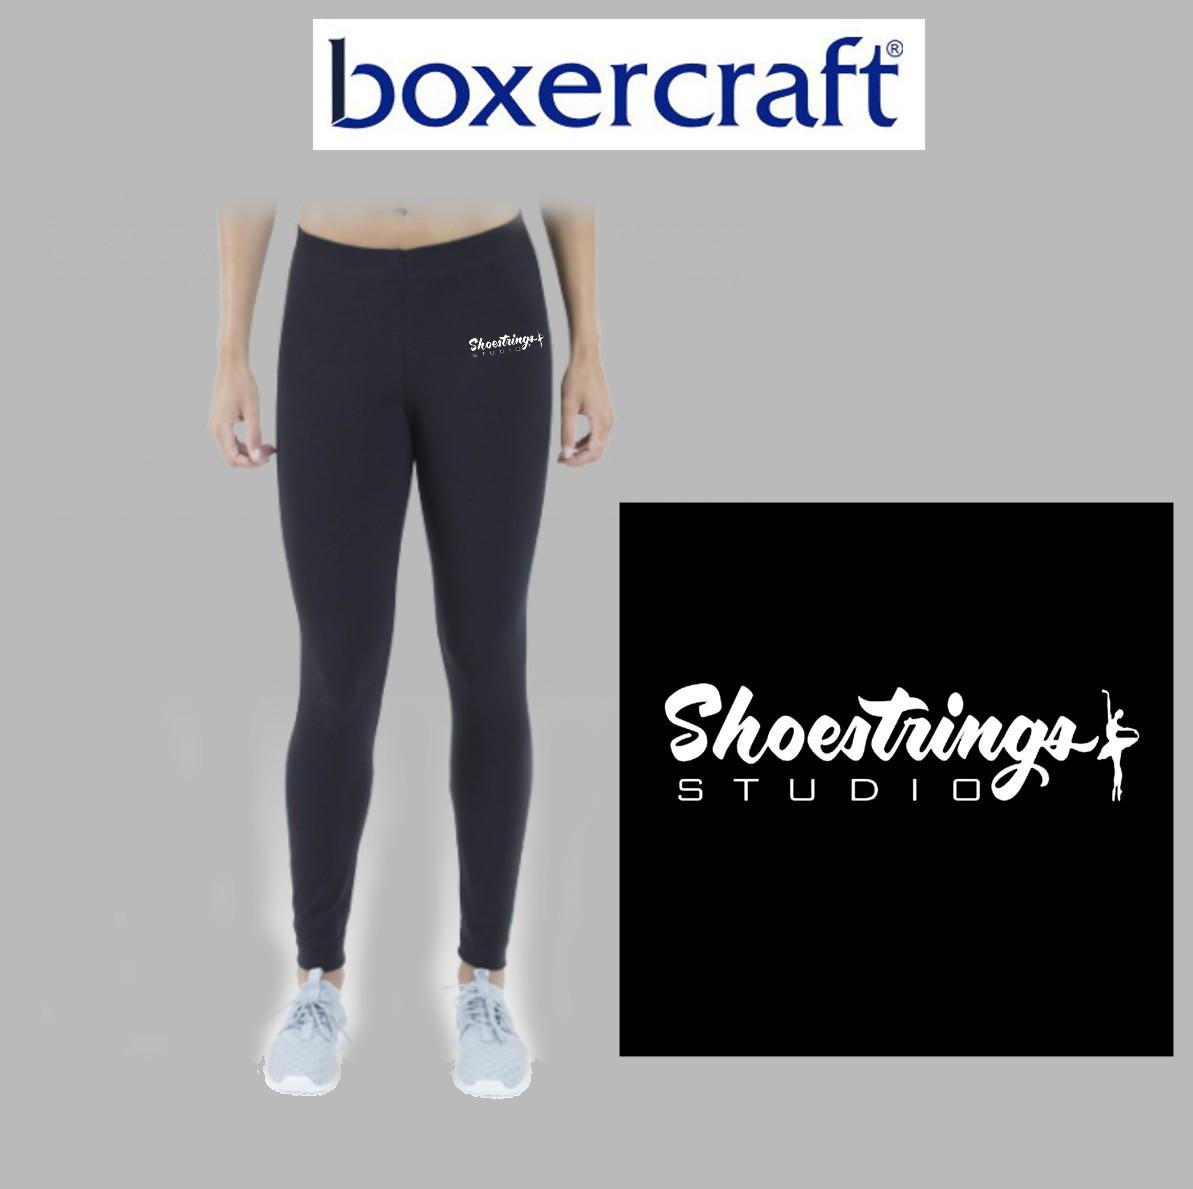 Shoestrings Studio Boxercraft Love em' Longer Leggings, Adult